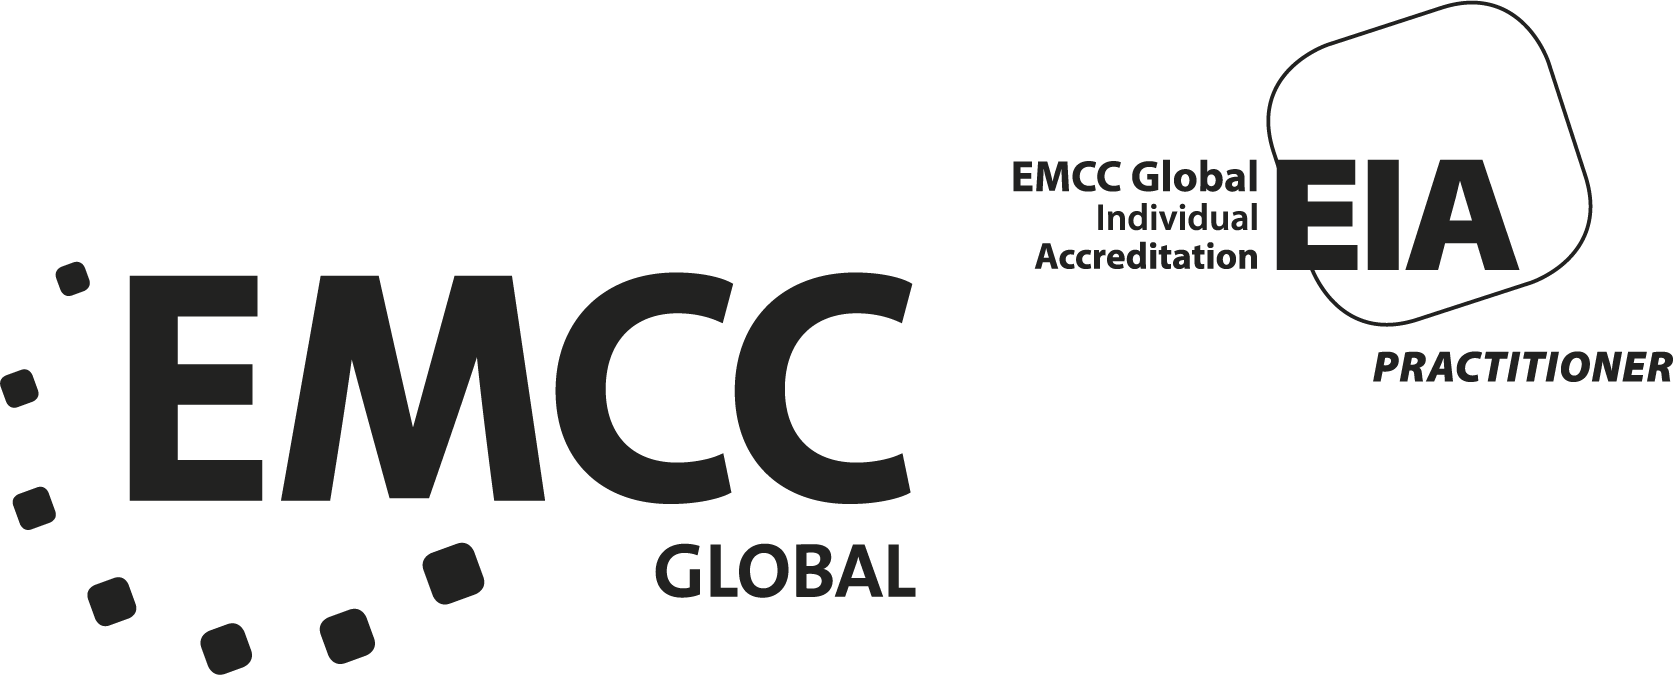 EMCC accreditation - logo - EIA+EMCC - black on white - P